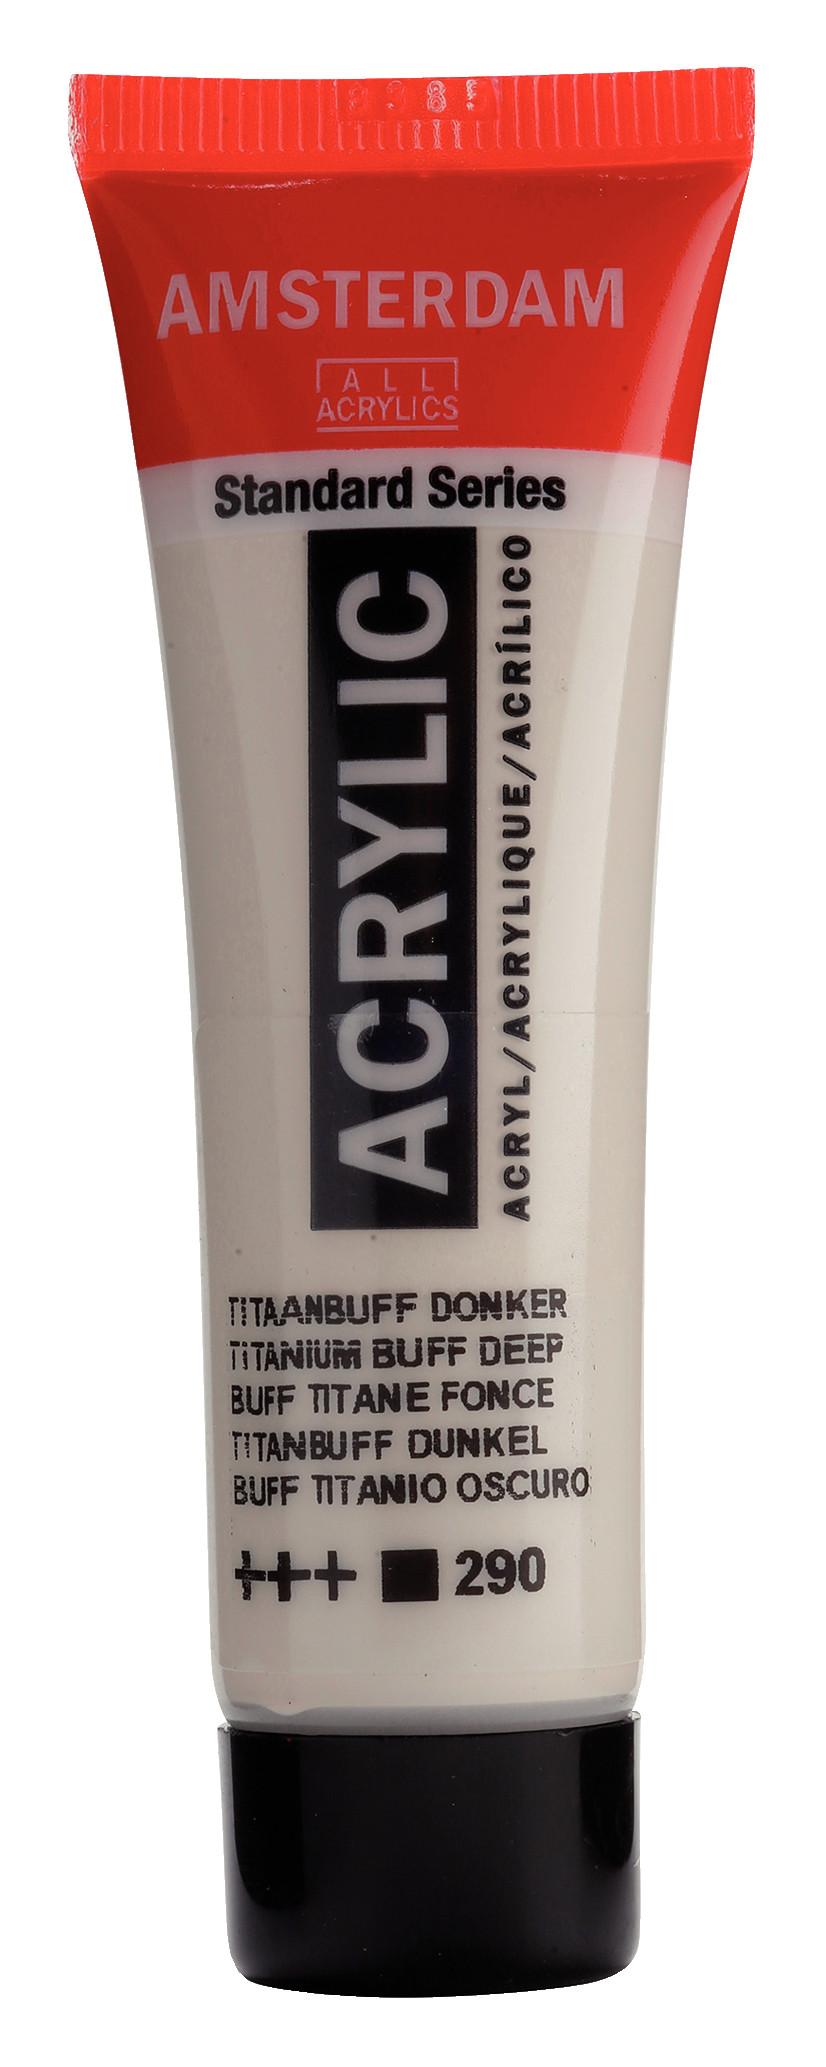 Amsterdam Standard Series Acrylic Tube 20 ml Titanium buff deep 290